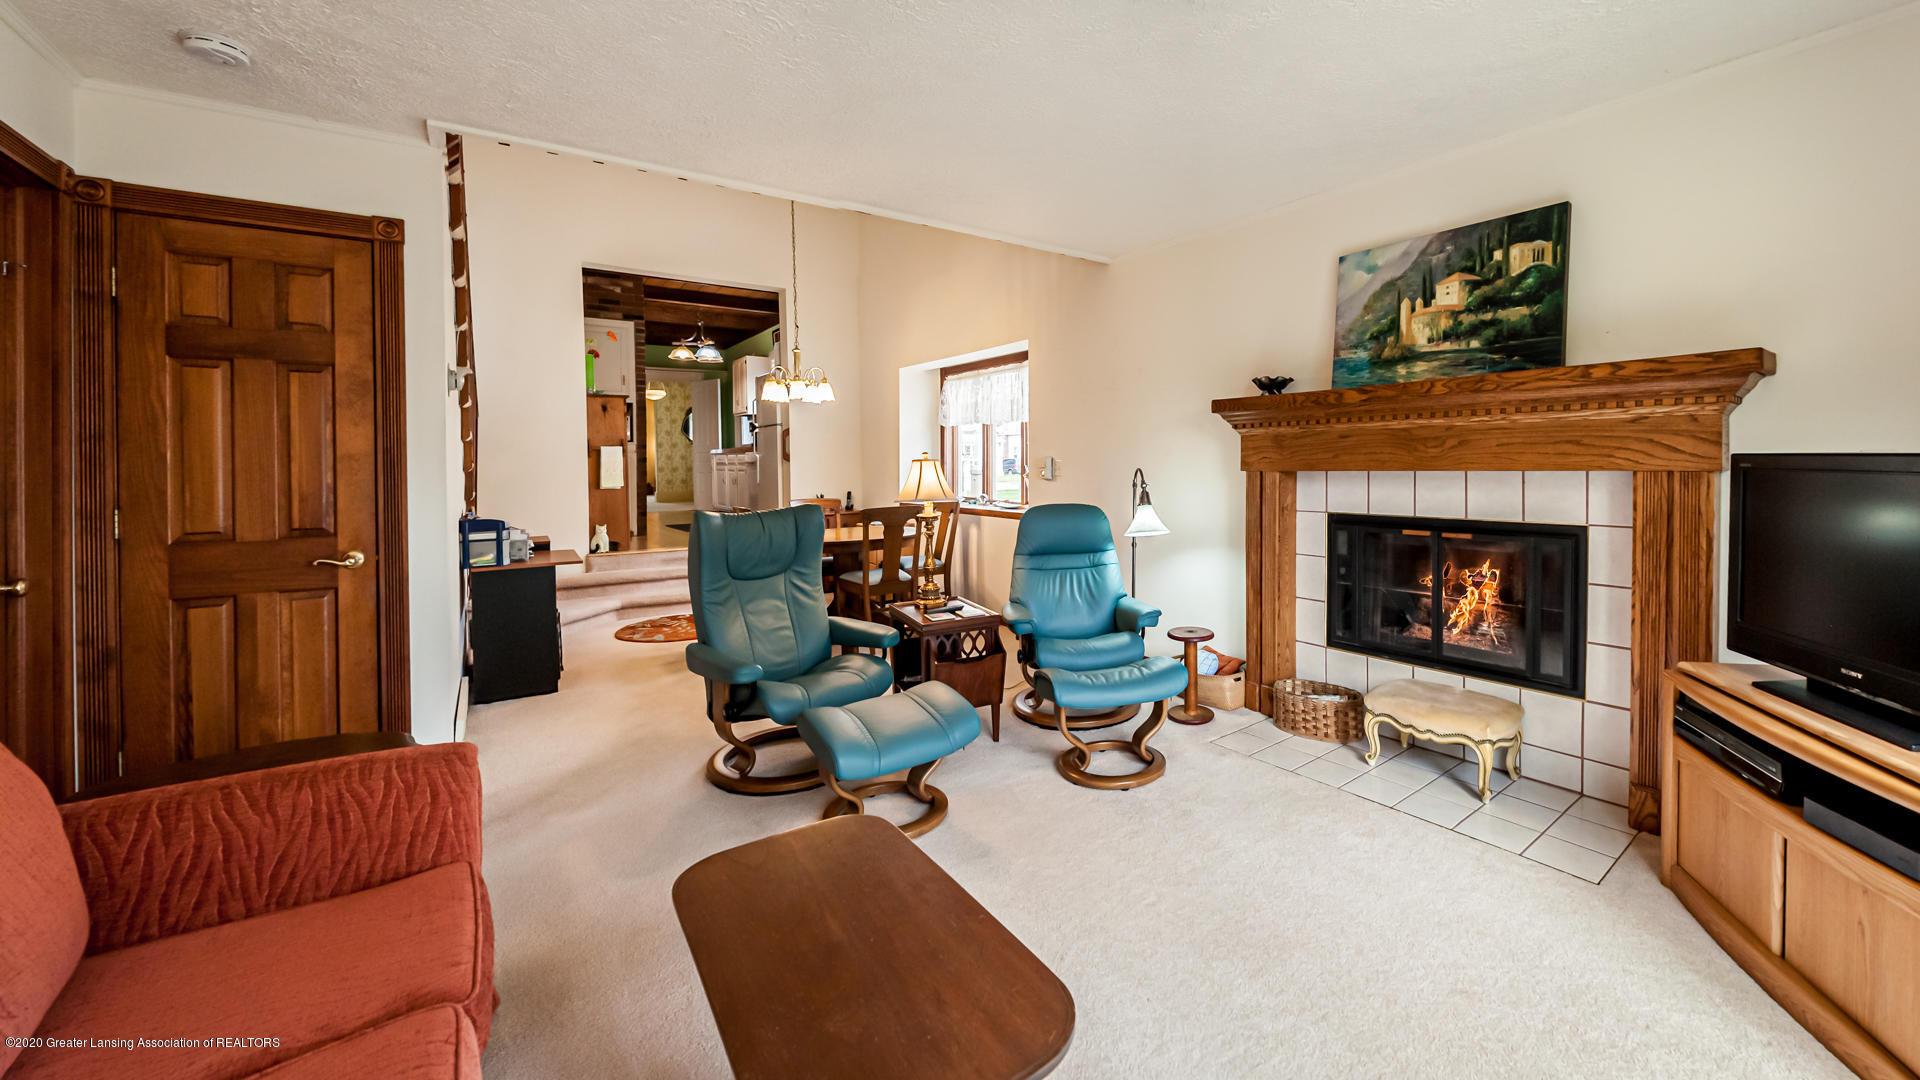 815 W Jefferson St - Living Room - 3